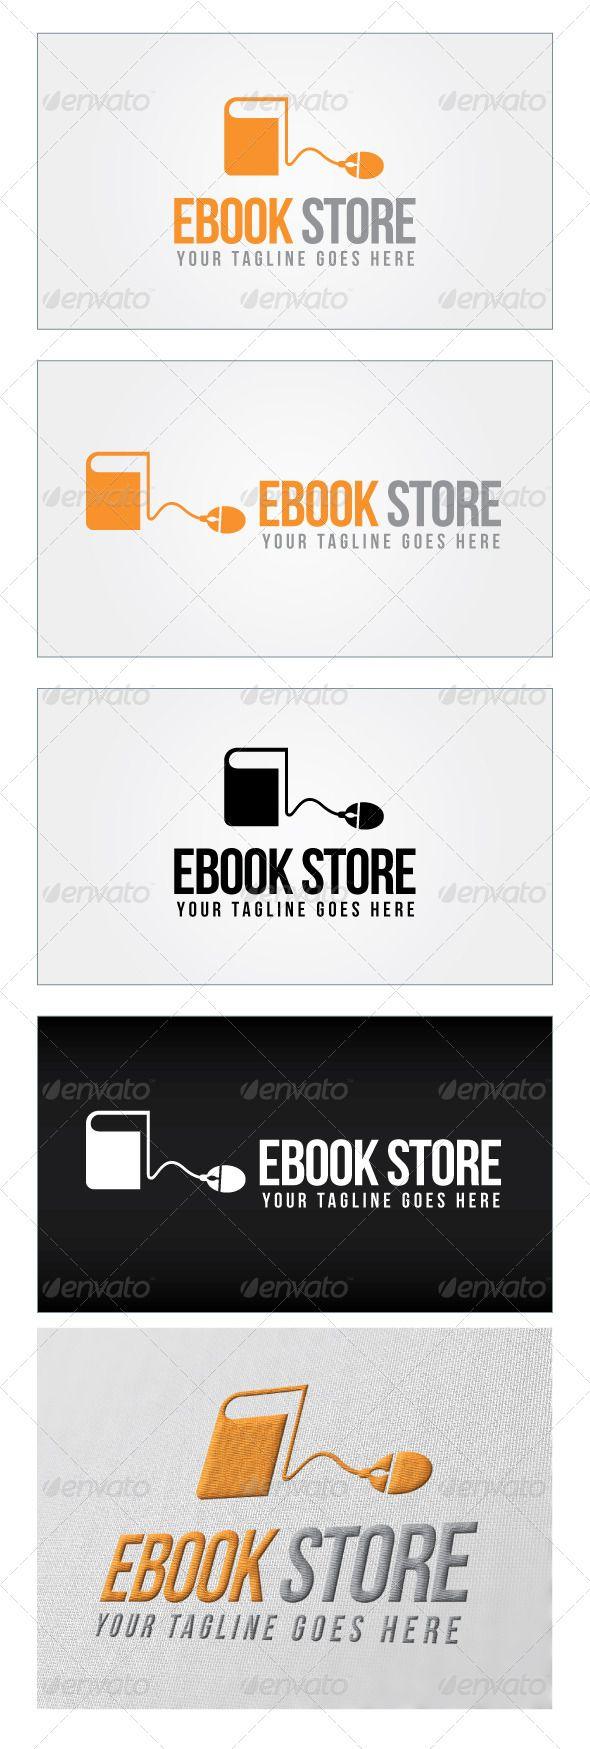 Ebook Store Logo Template